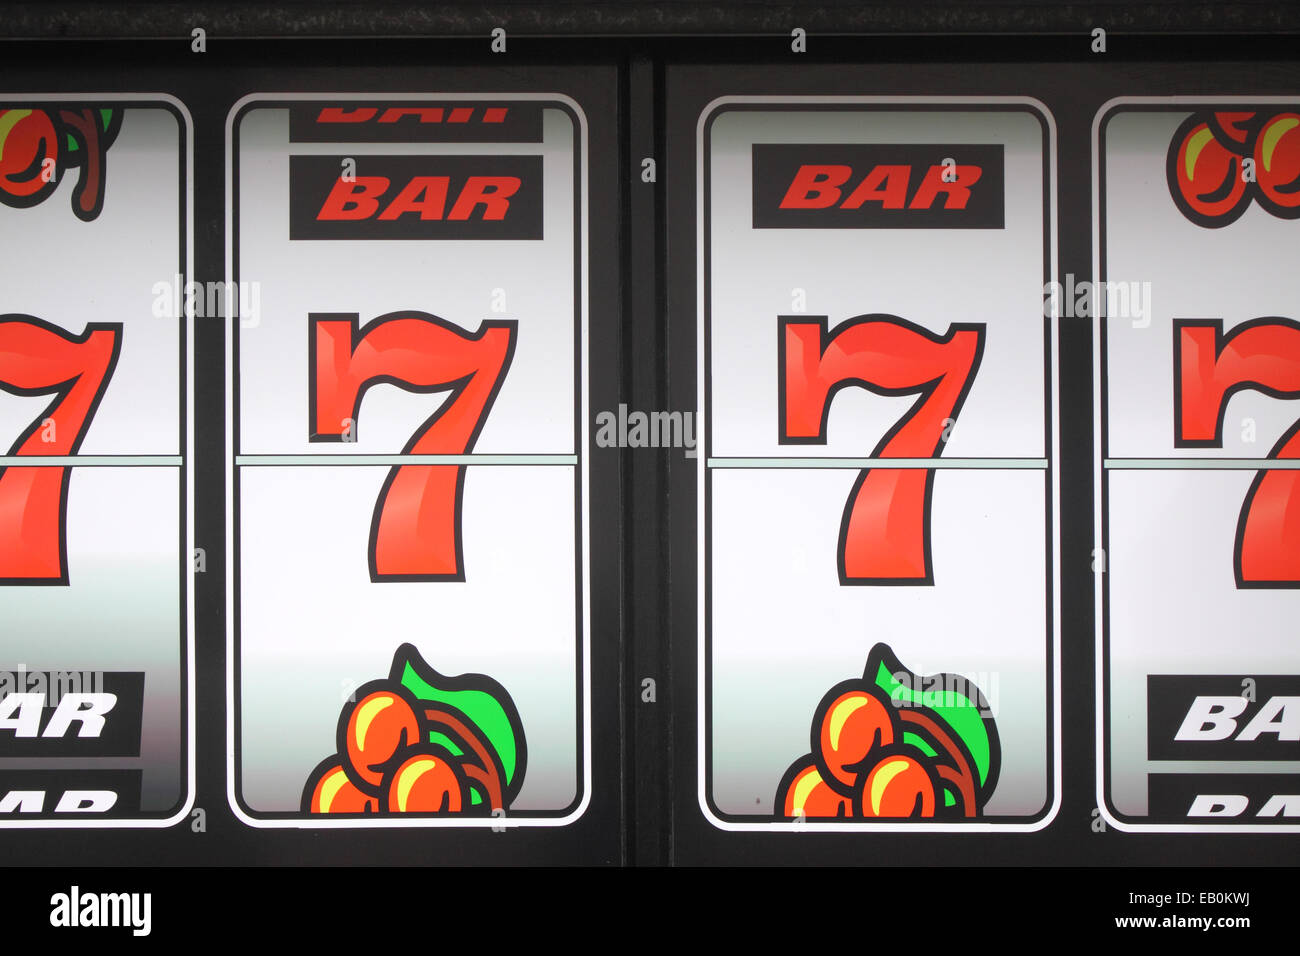 Graphic of a jackpot winning row of 7's on slot machine - Stock Image